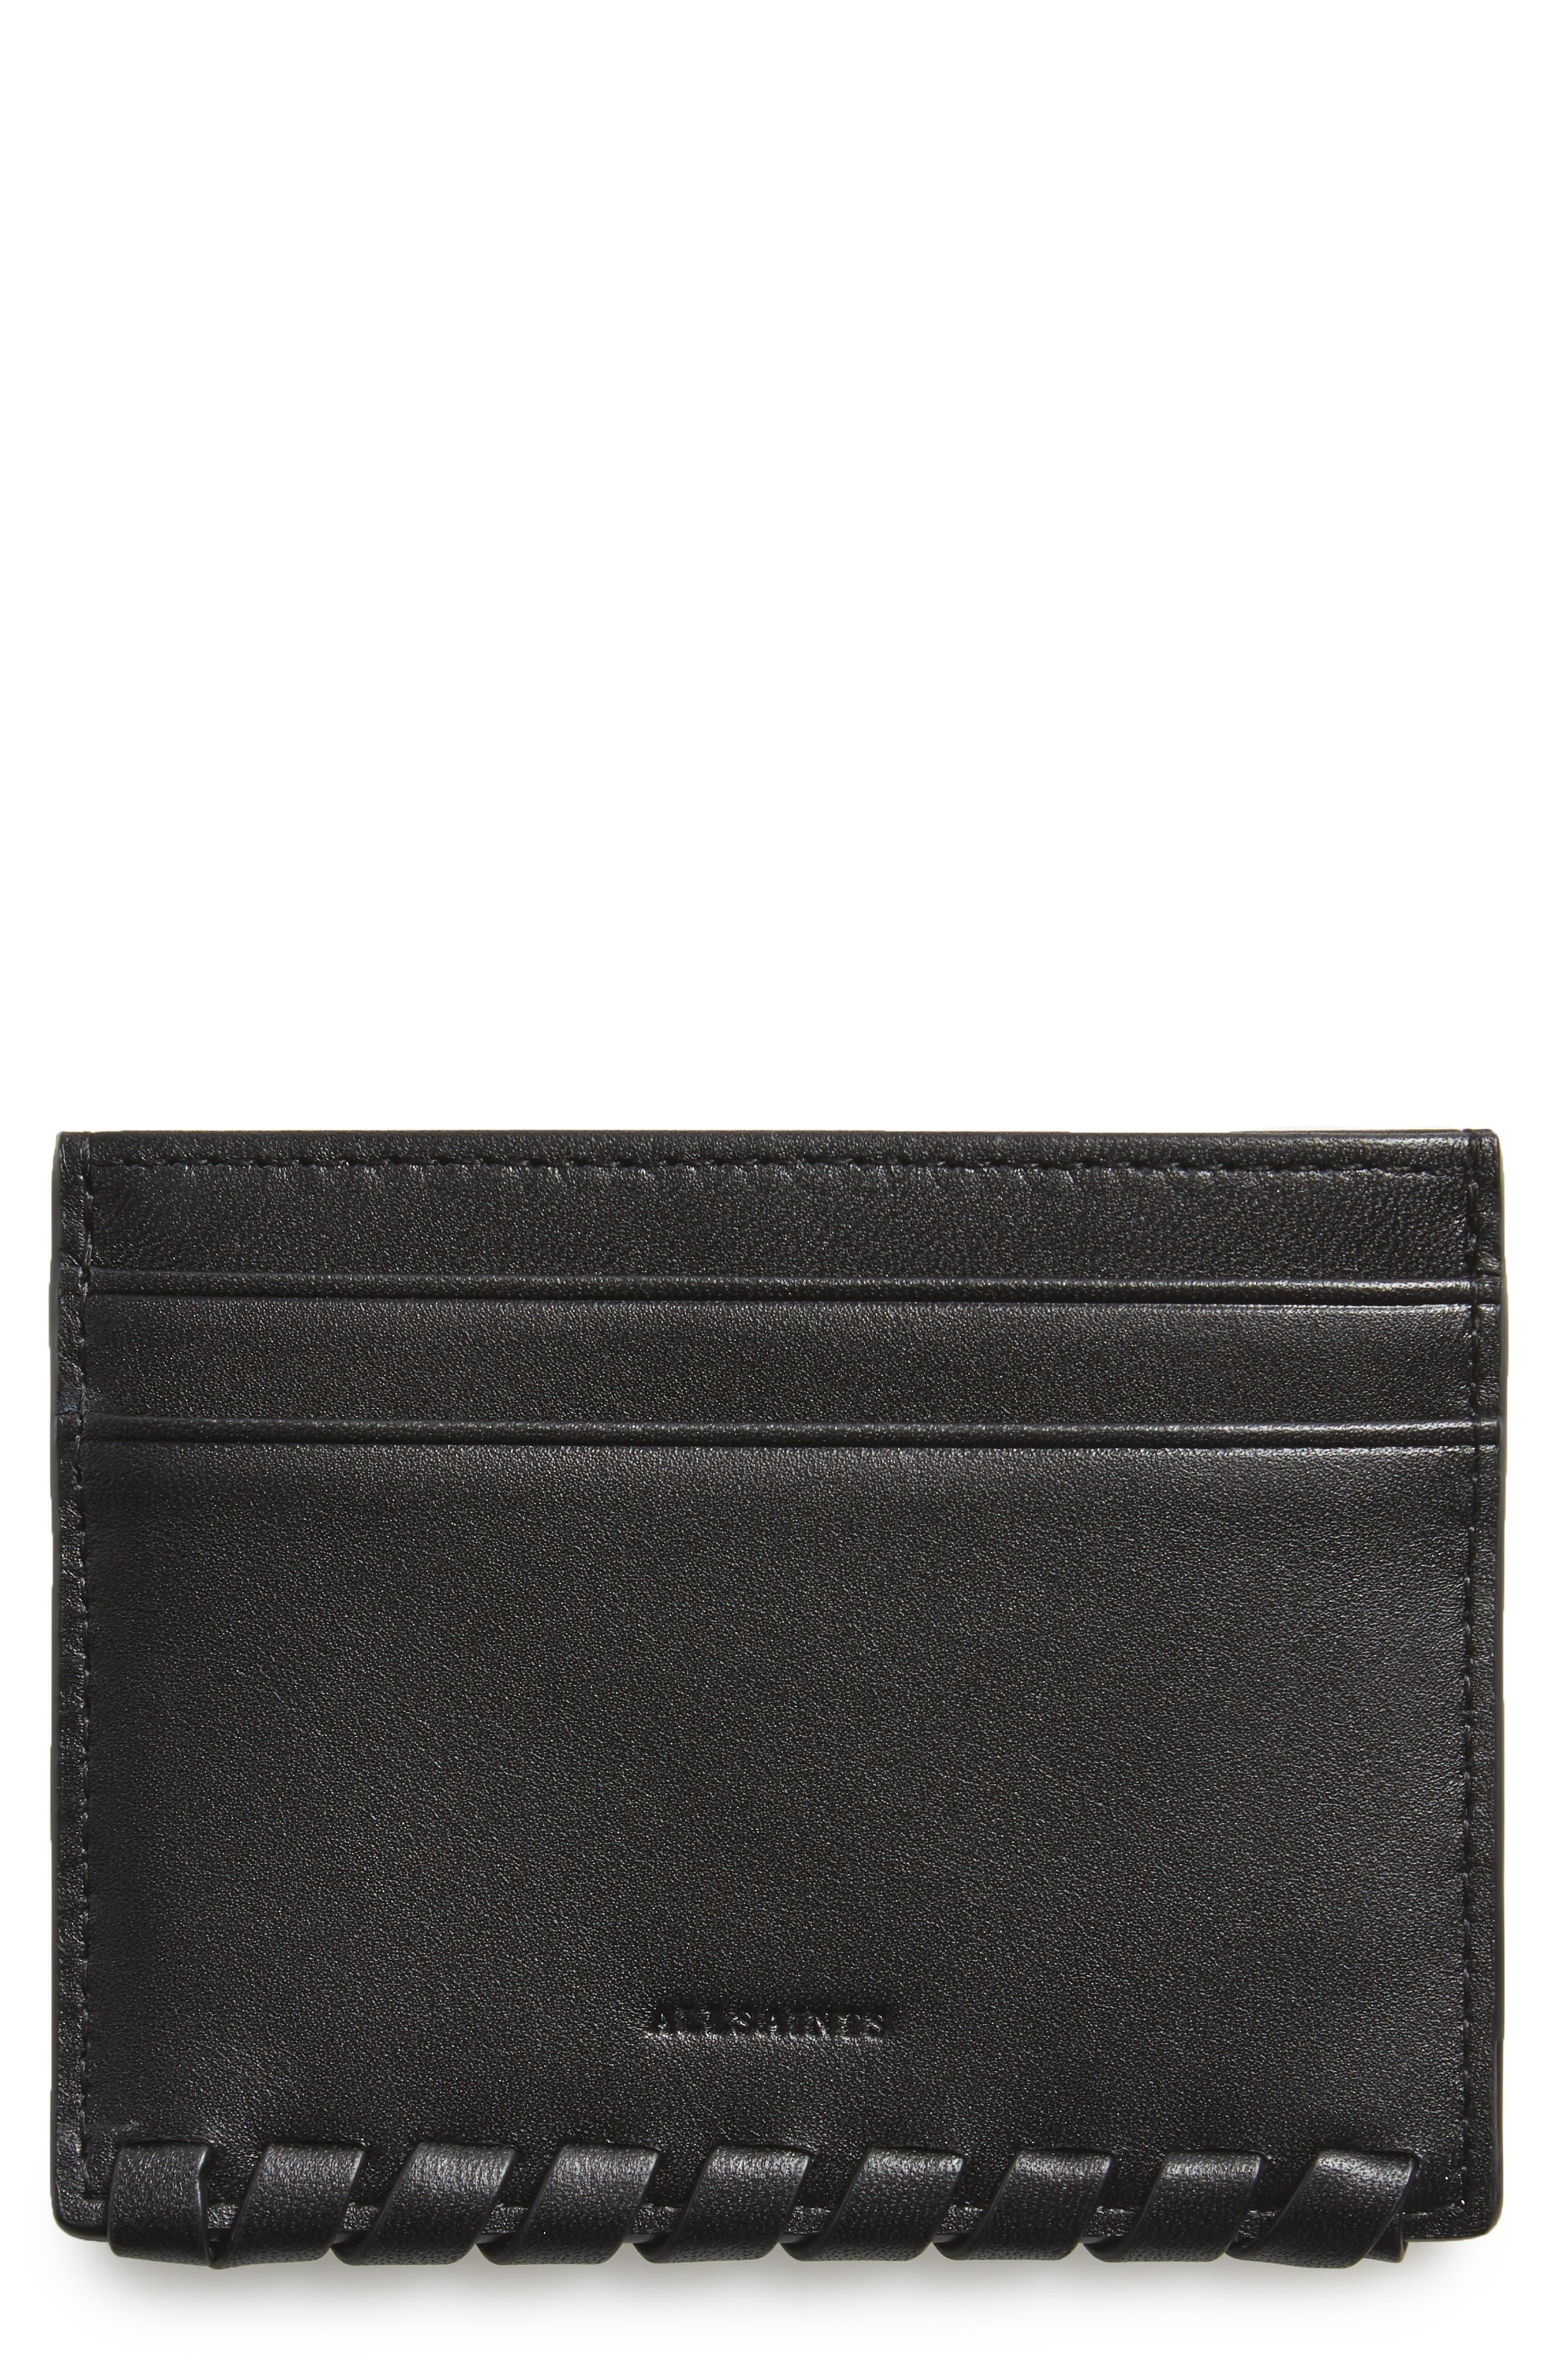 Main Image - ALLSAINTS Kita Pebbled Leather Card Case